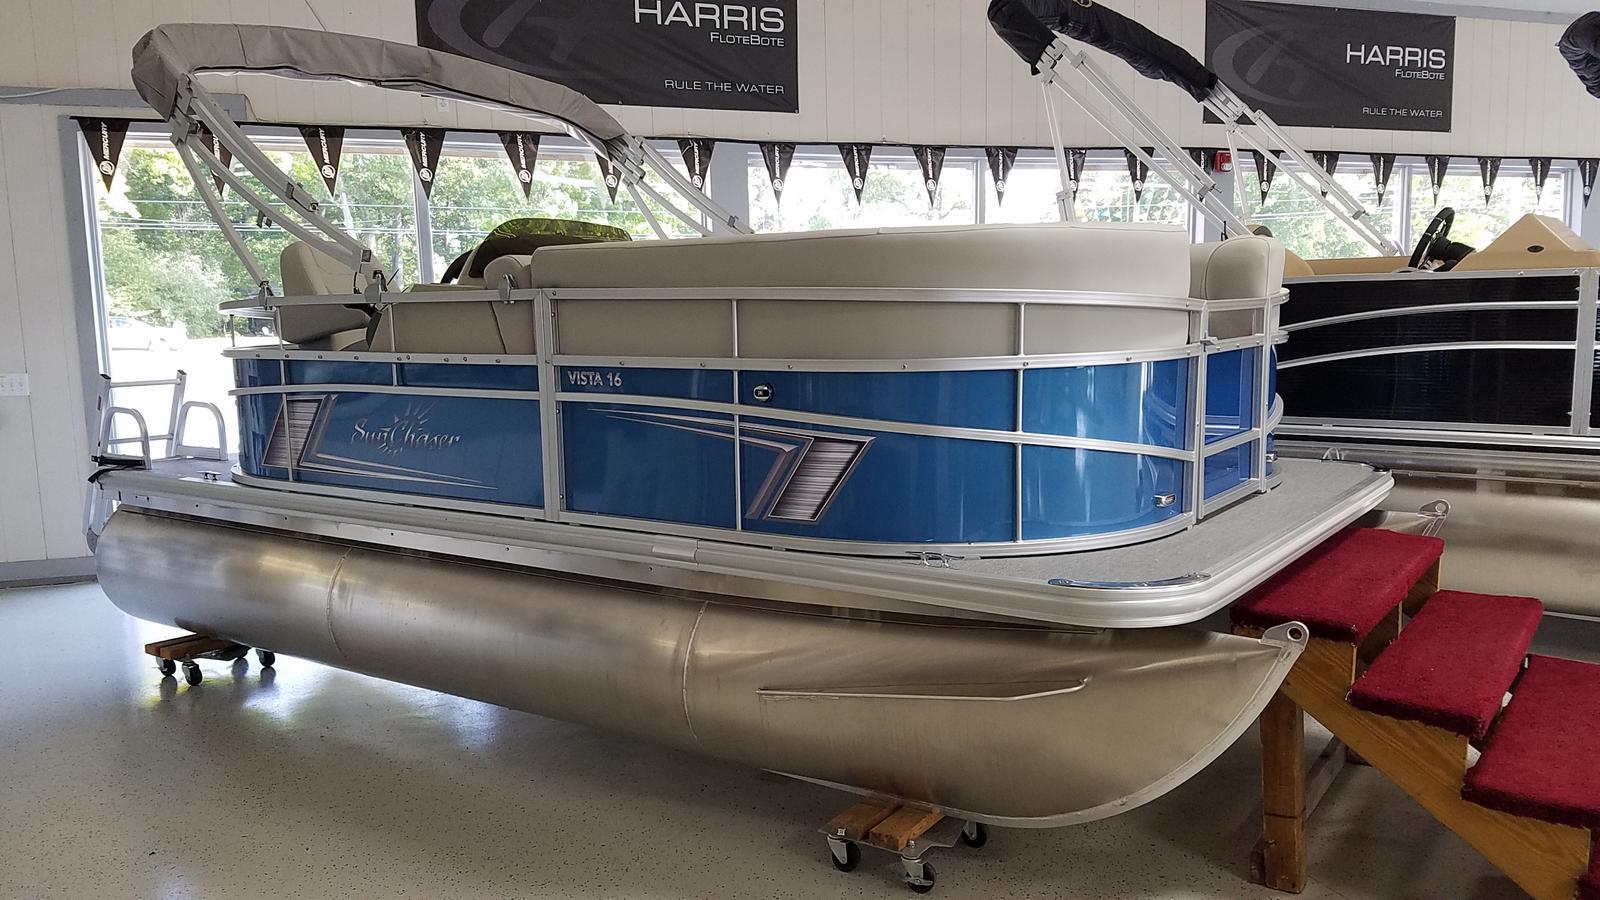 2021 SunChaser boat for sale, model of the boat is Vista 16 LR & Image # 1 of 16